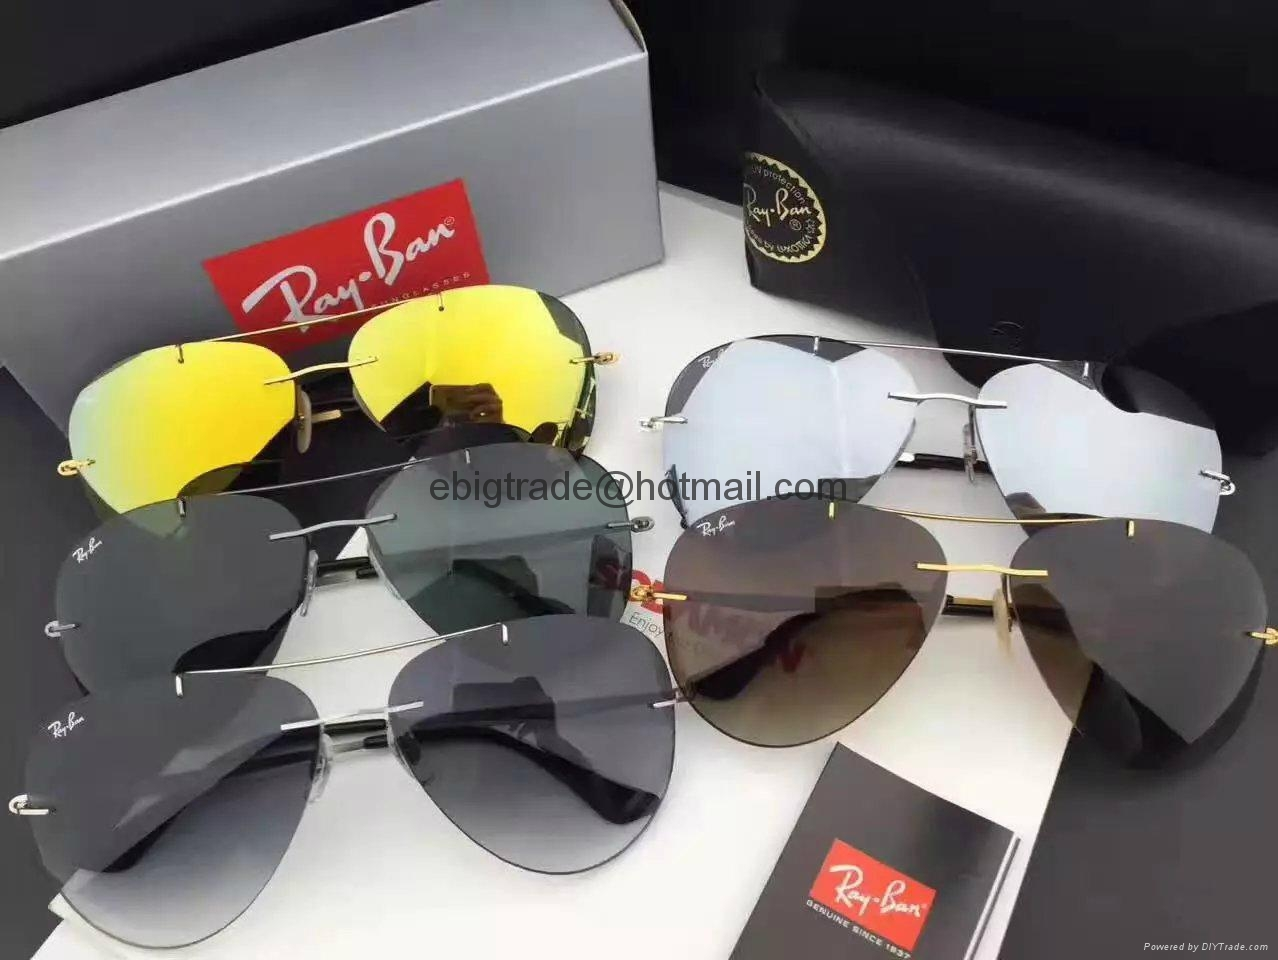 Cheap RAY-BAN Sunglasses for men replica RAY-BAN Sunglasses for Sale